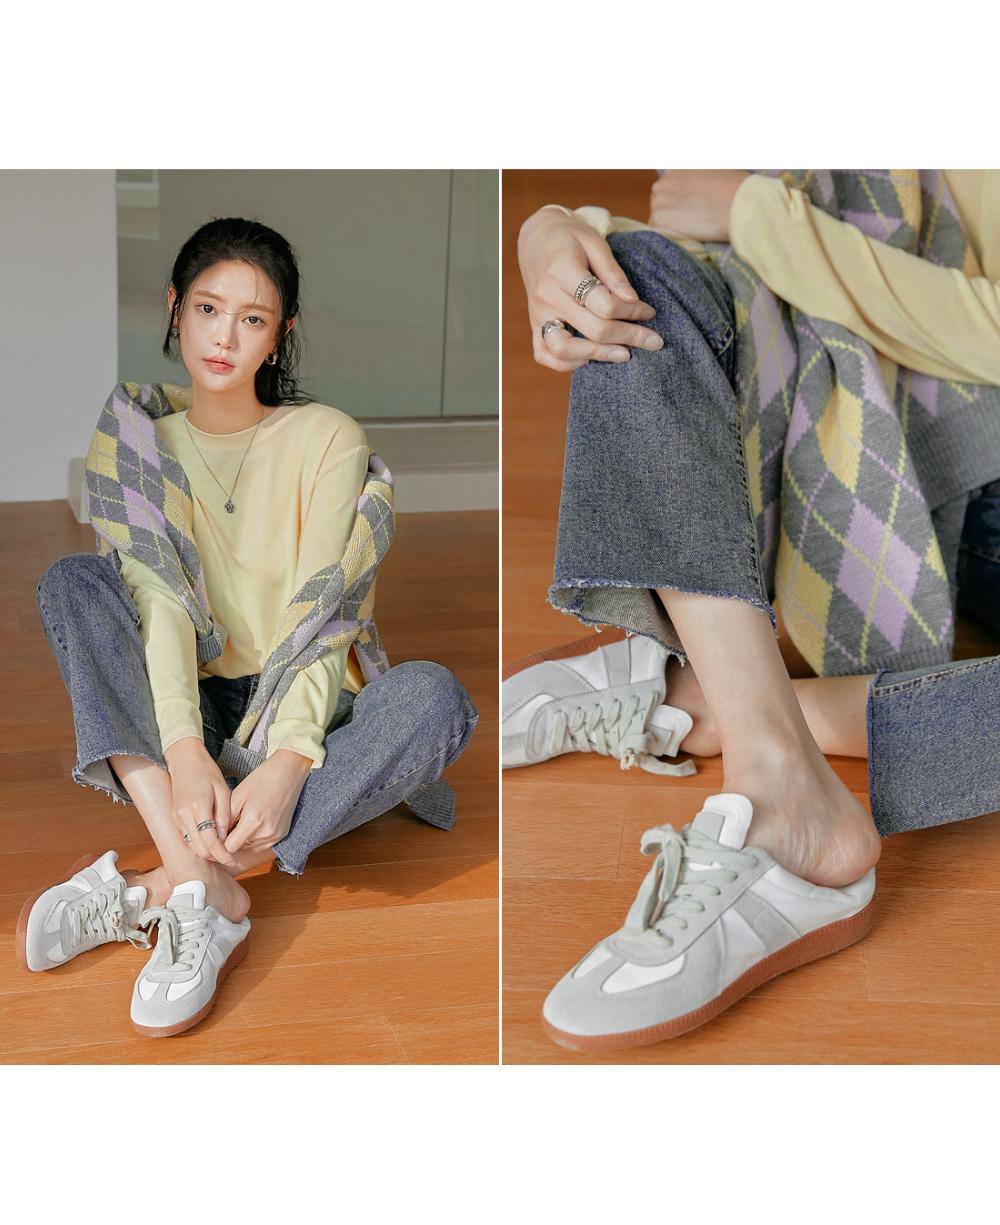 dress model image-S1L5